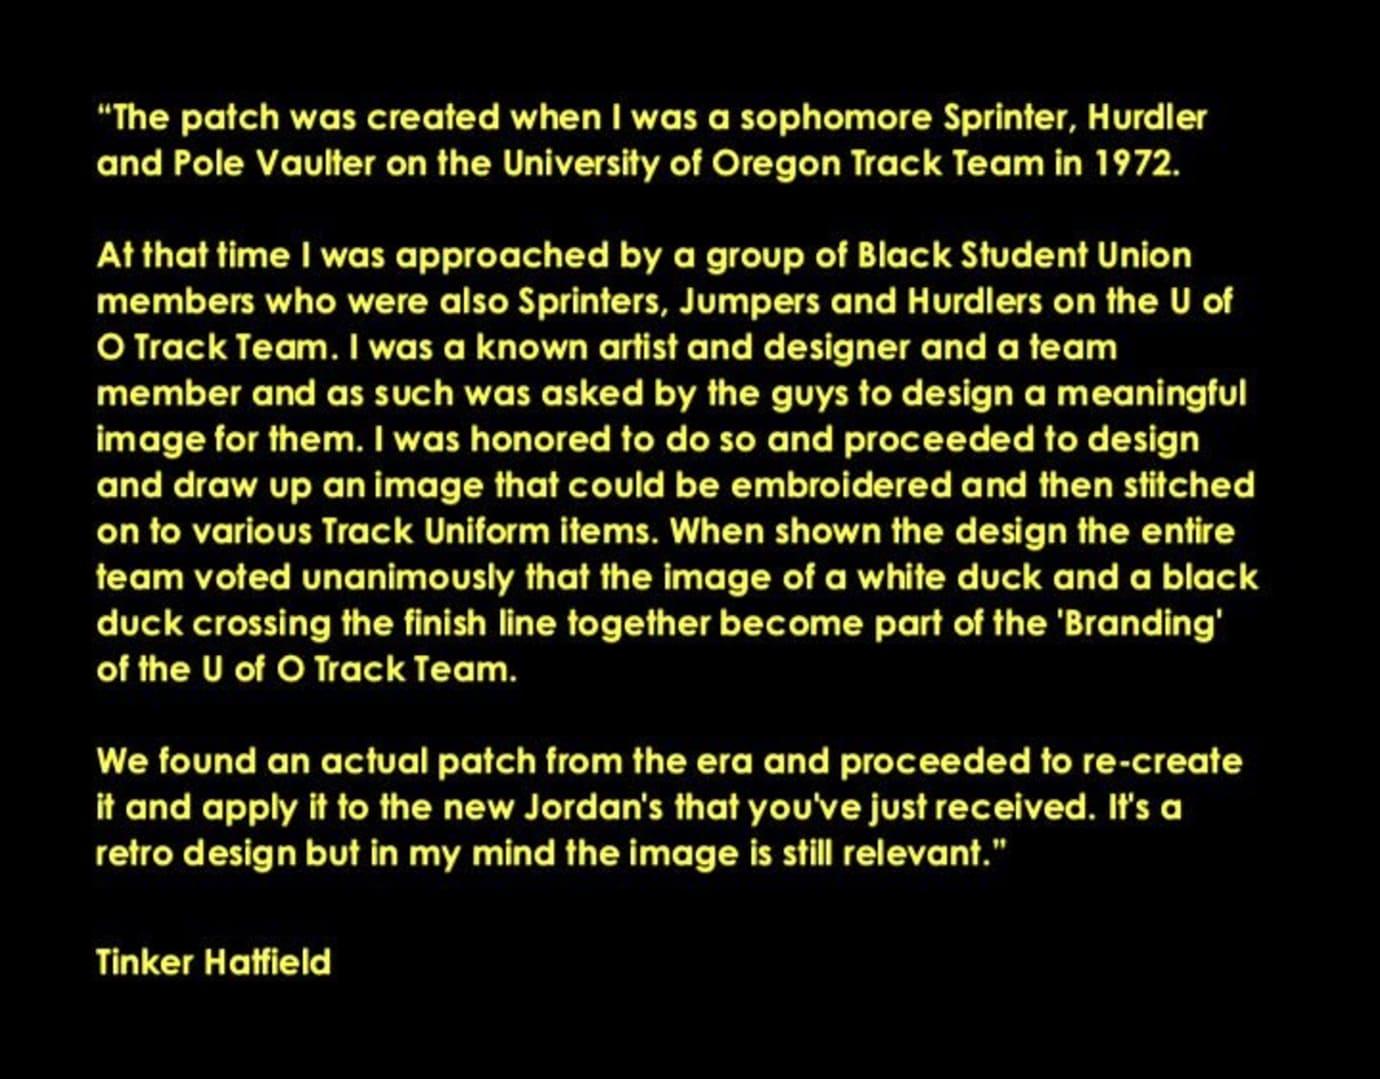 Tinker Hatfield Oregon Track & Field Patch